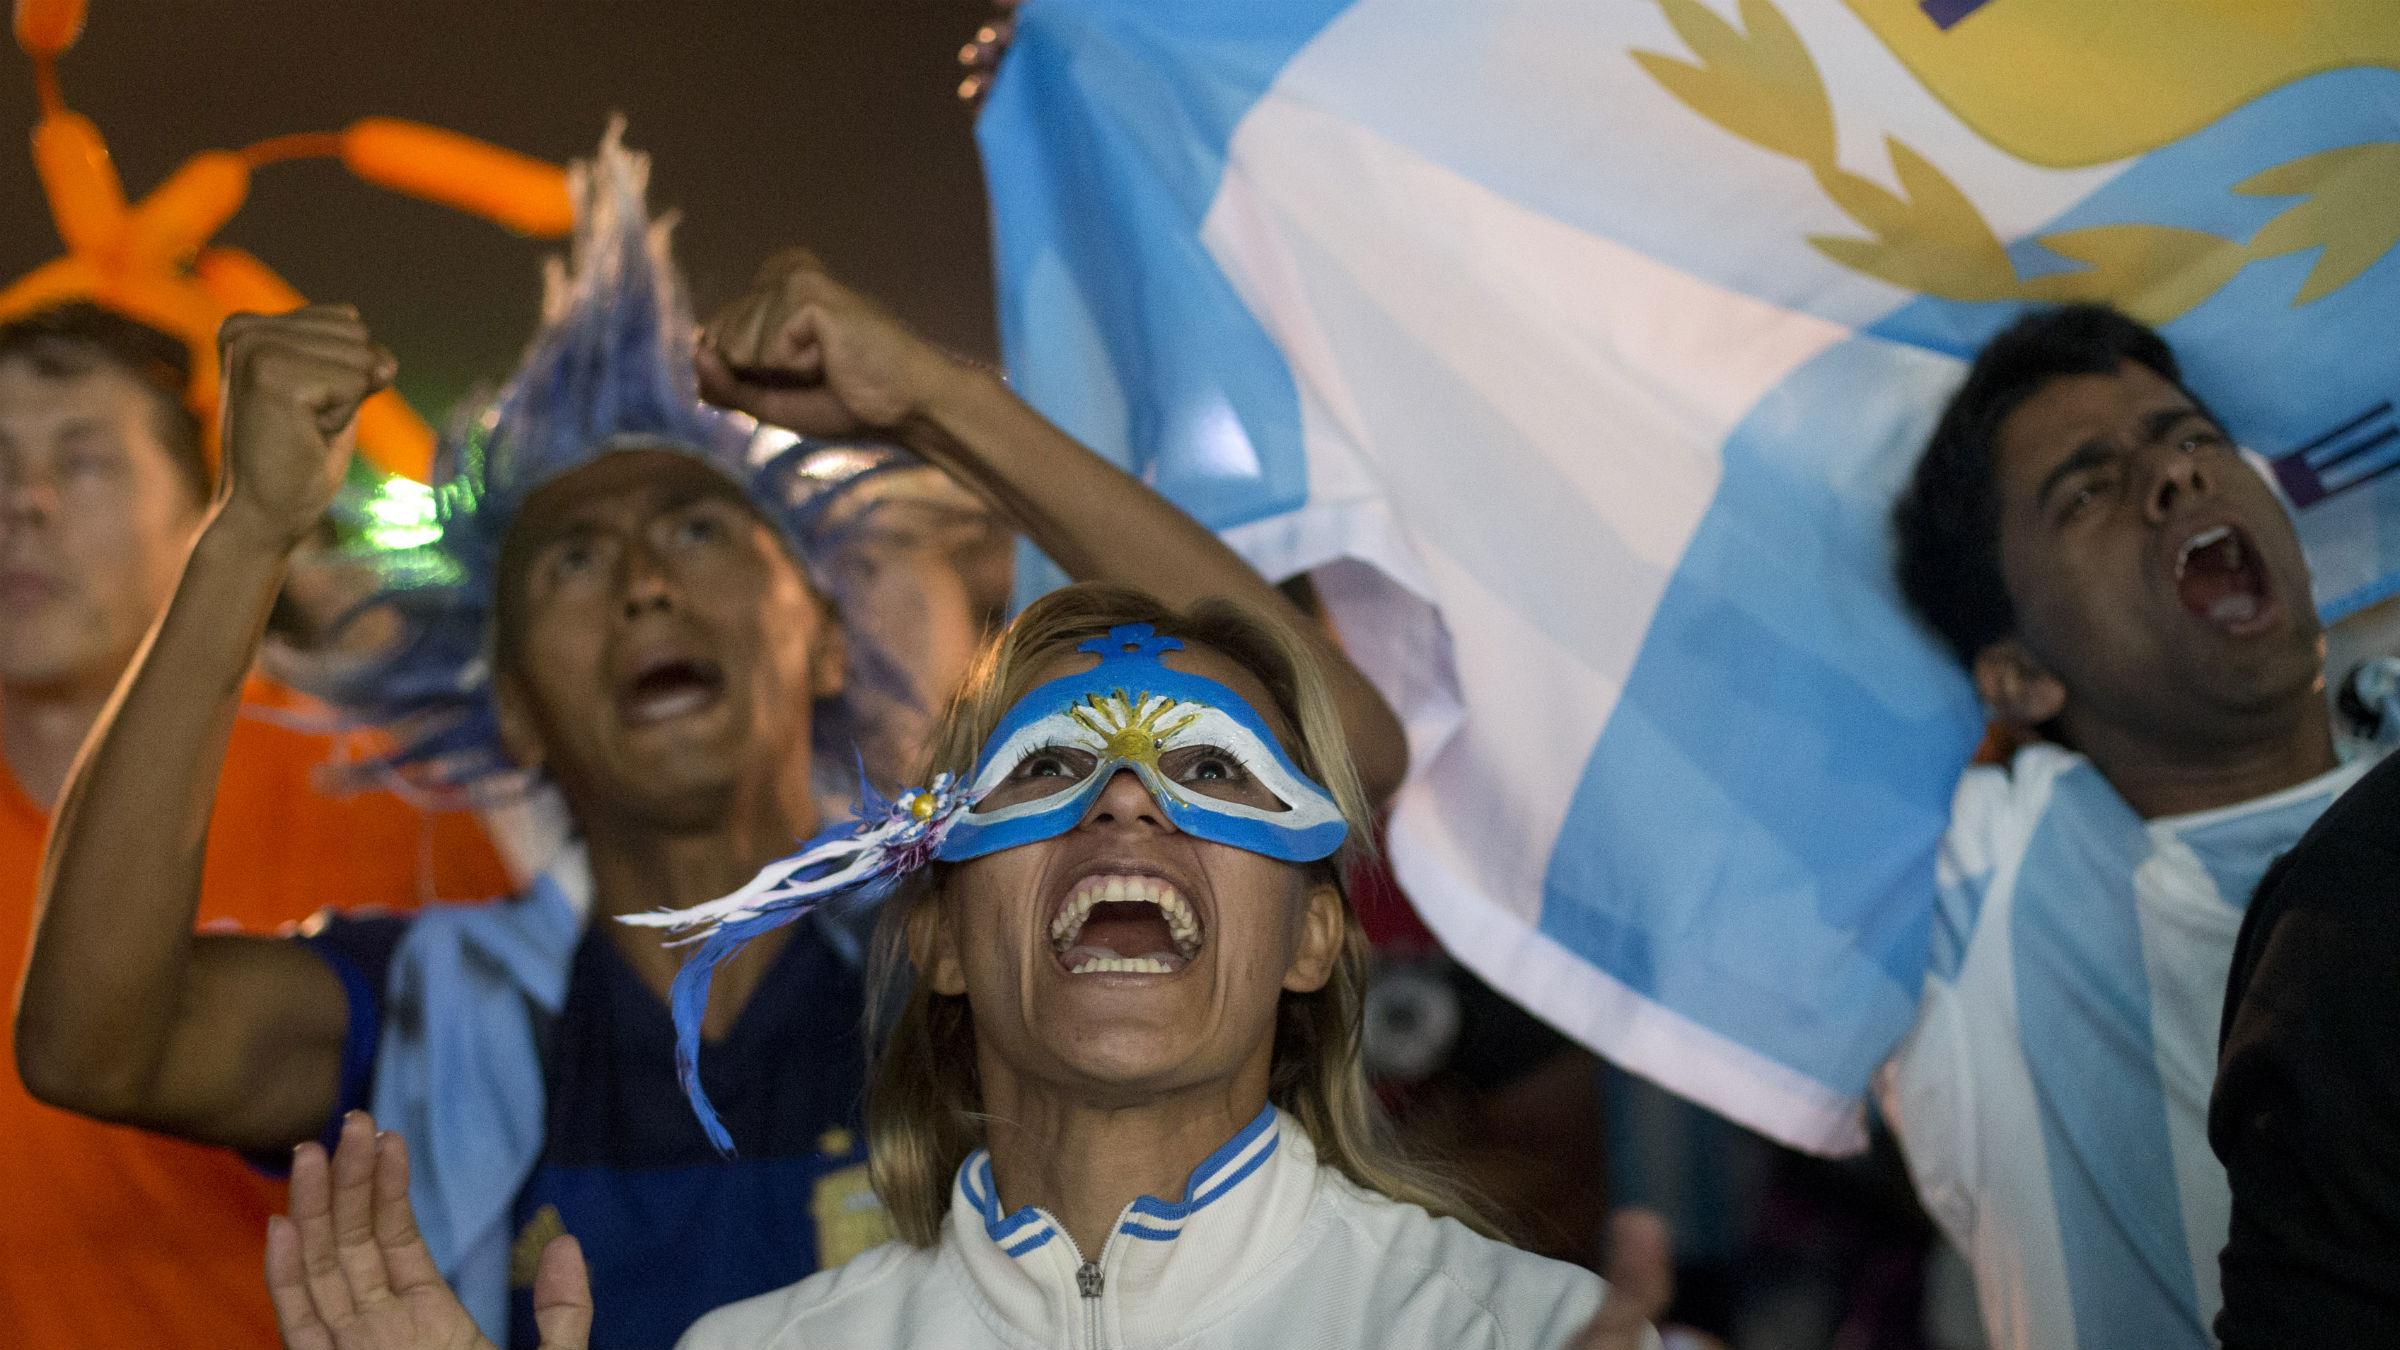 A fan of Argentina celebrates wearing a mask